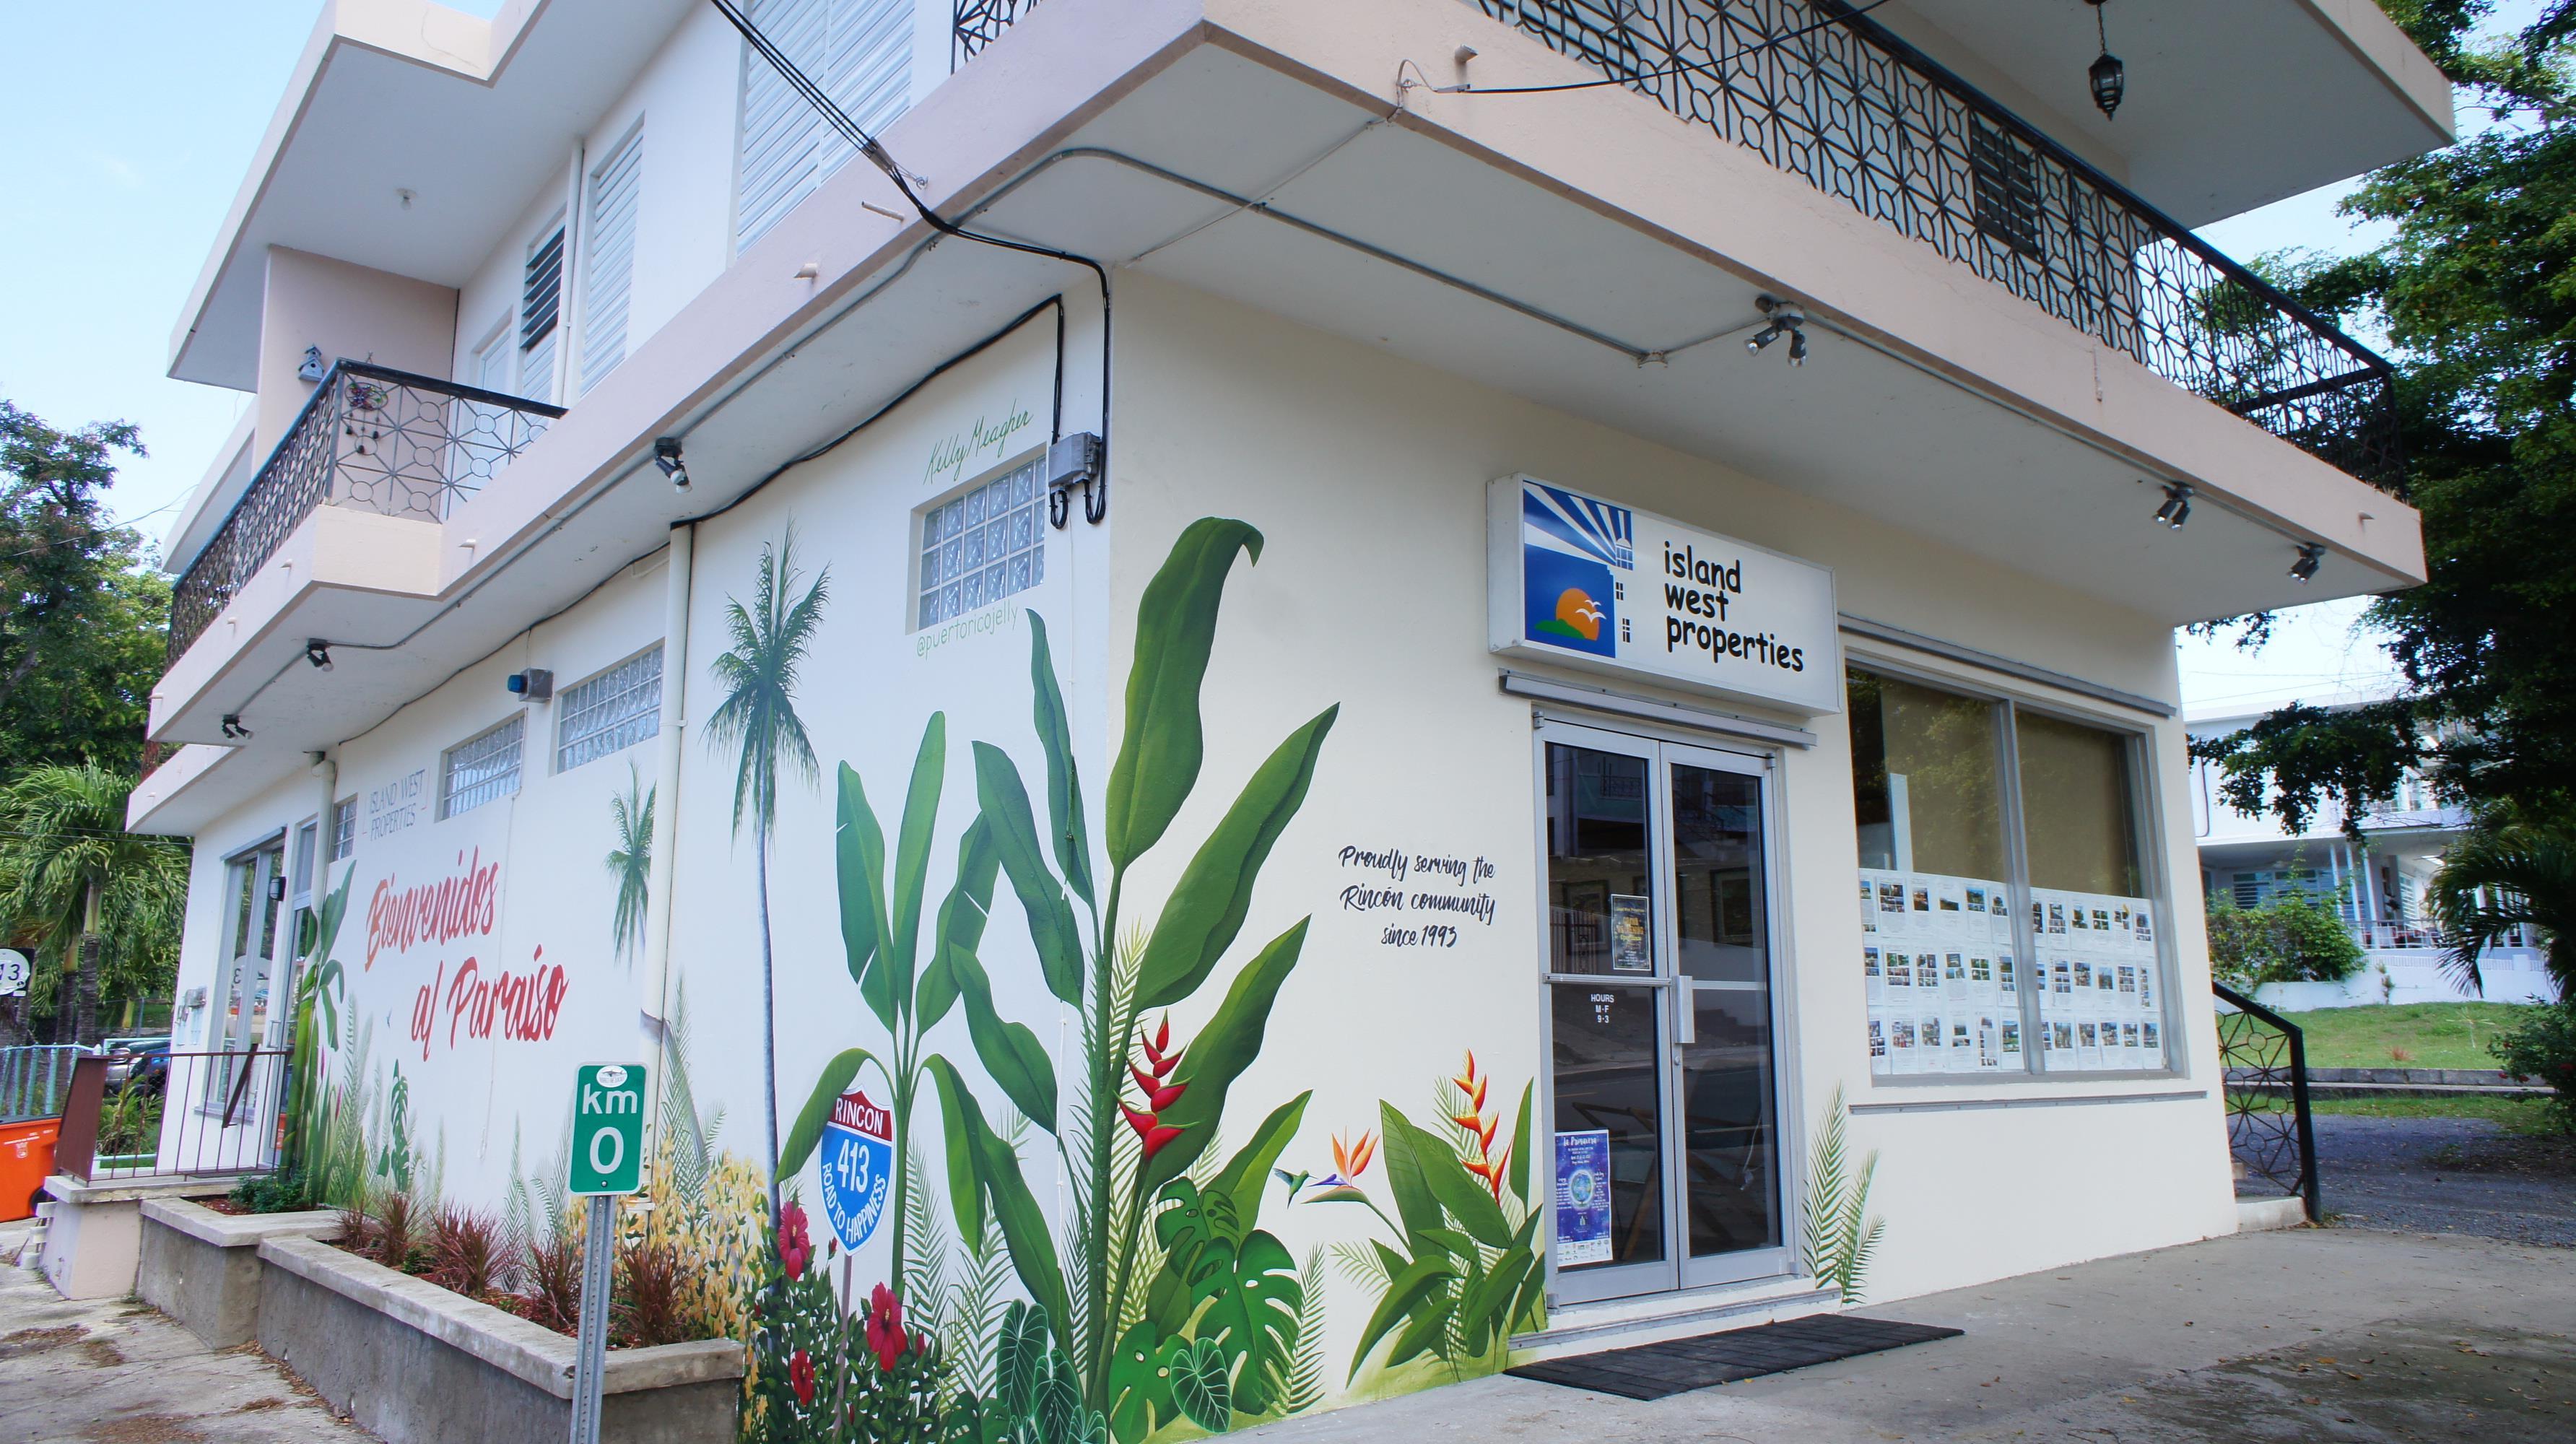 Rincon Property Sales